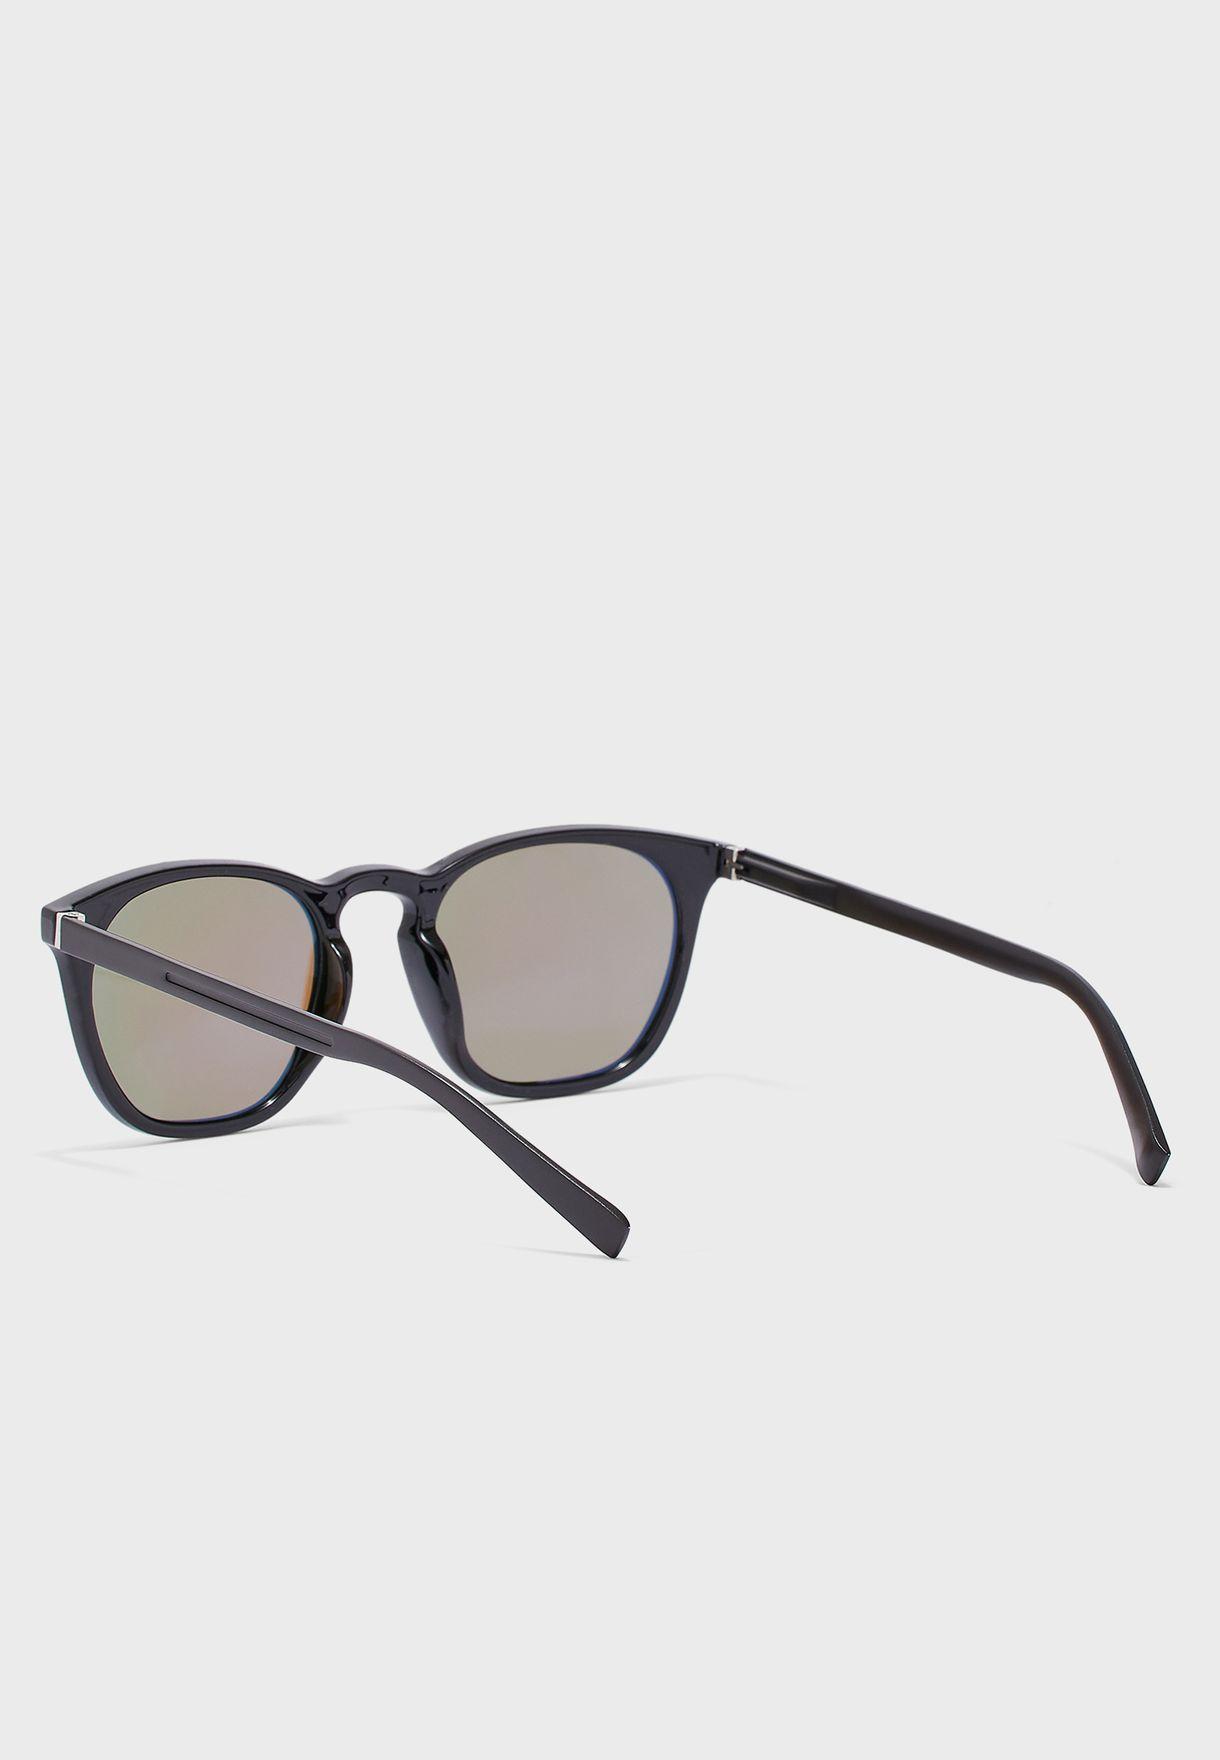 Polarized Wayfarer Sunglasses